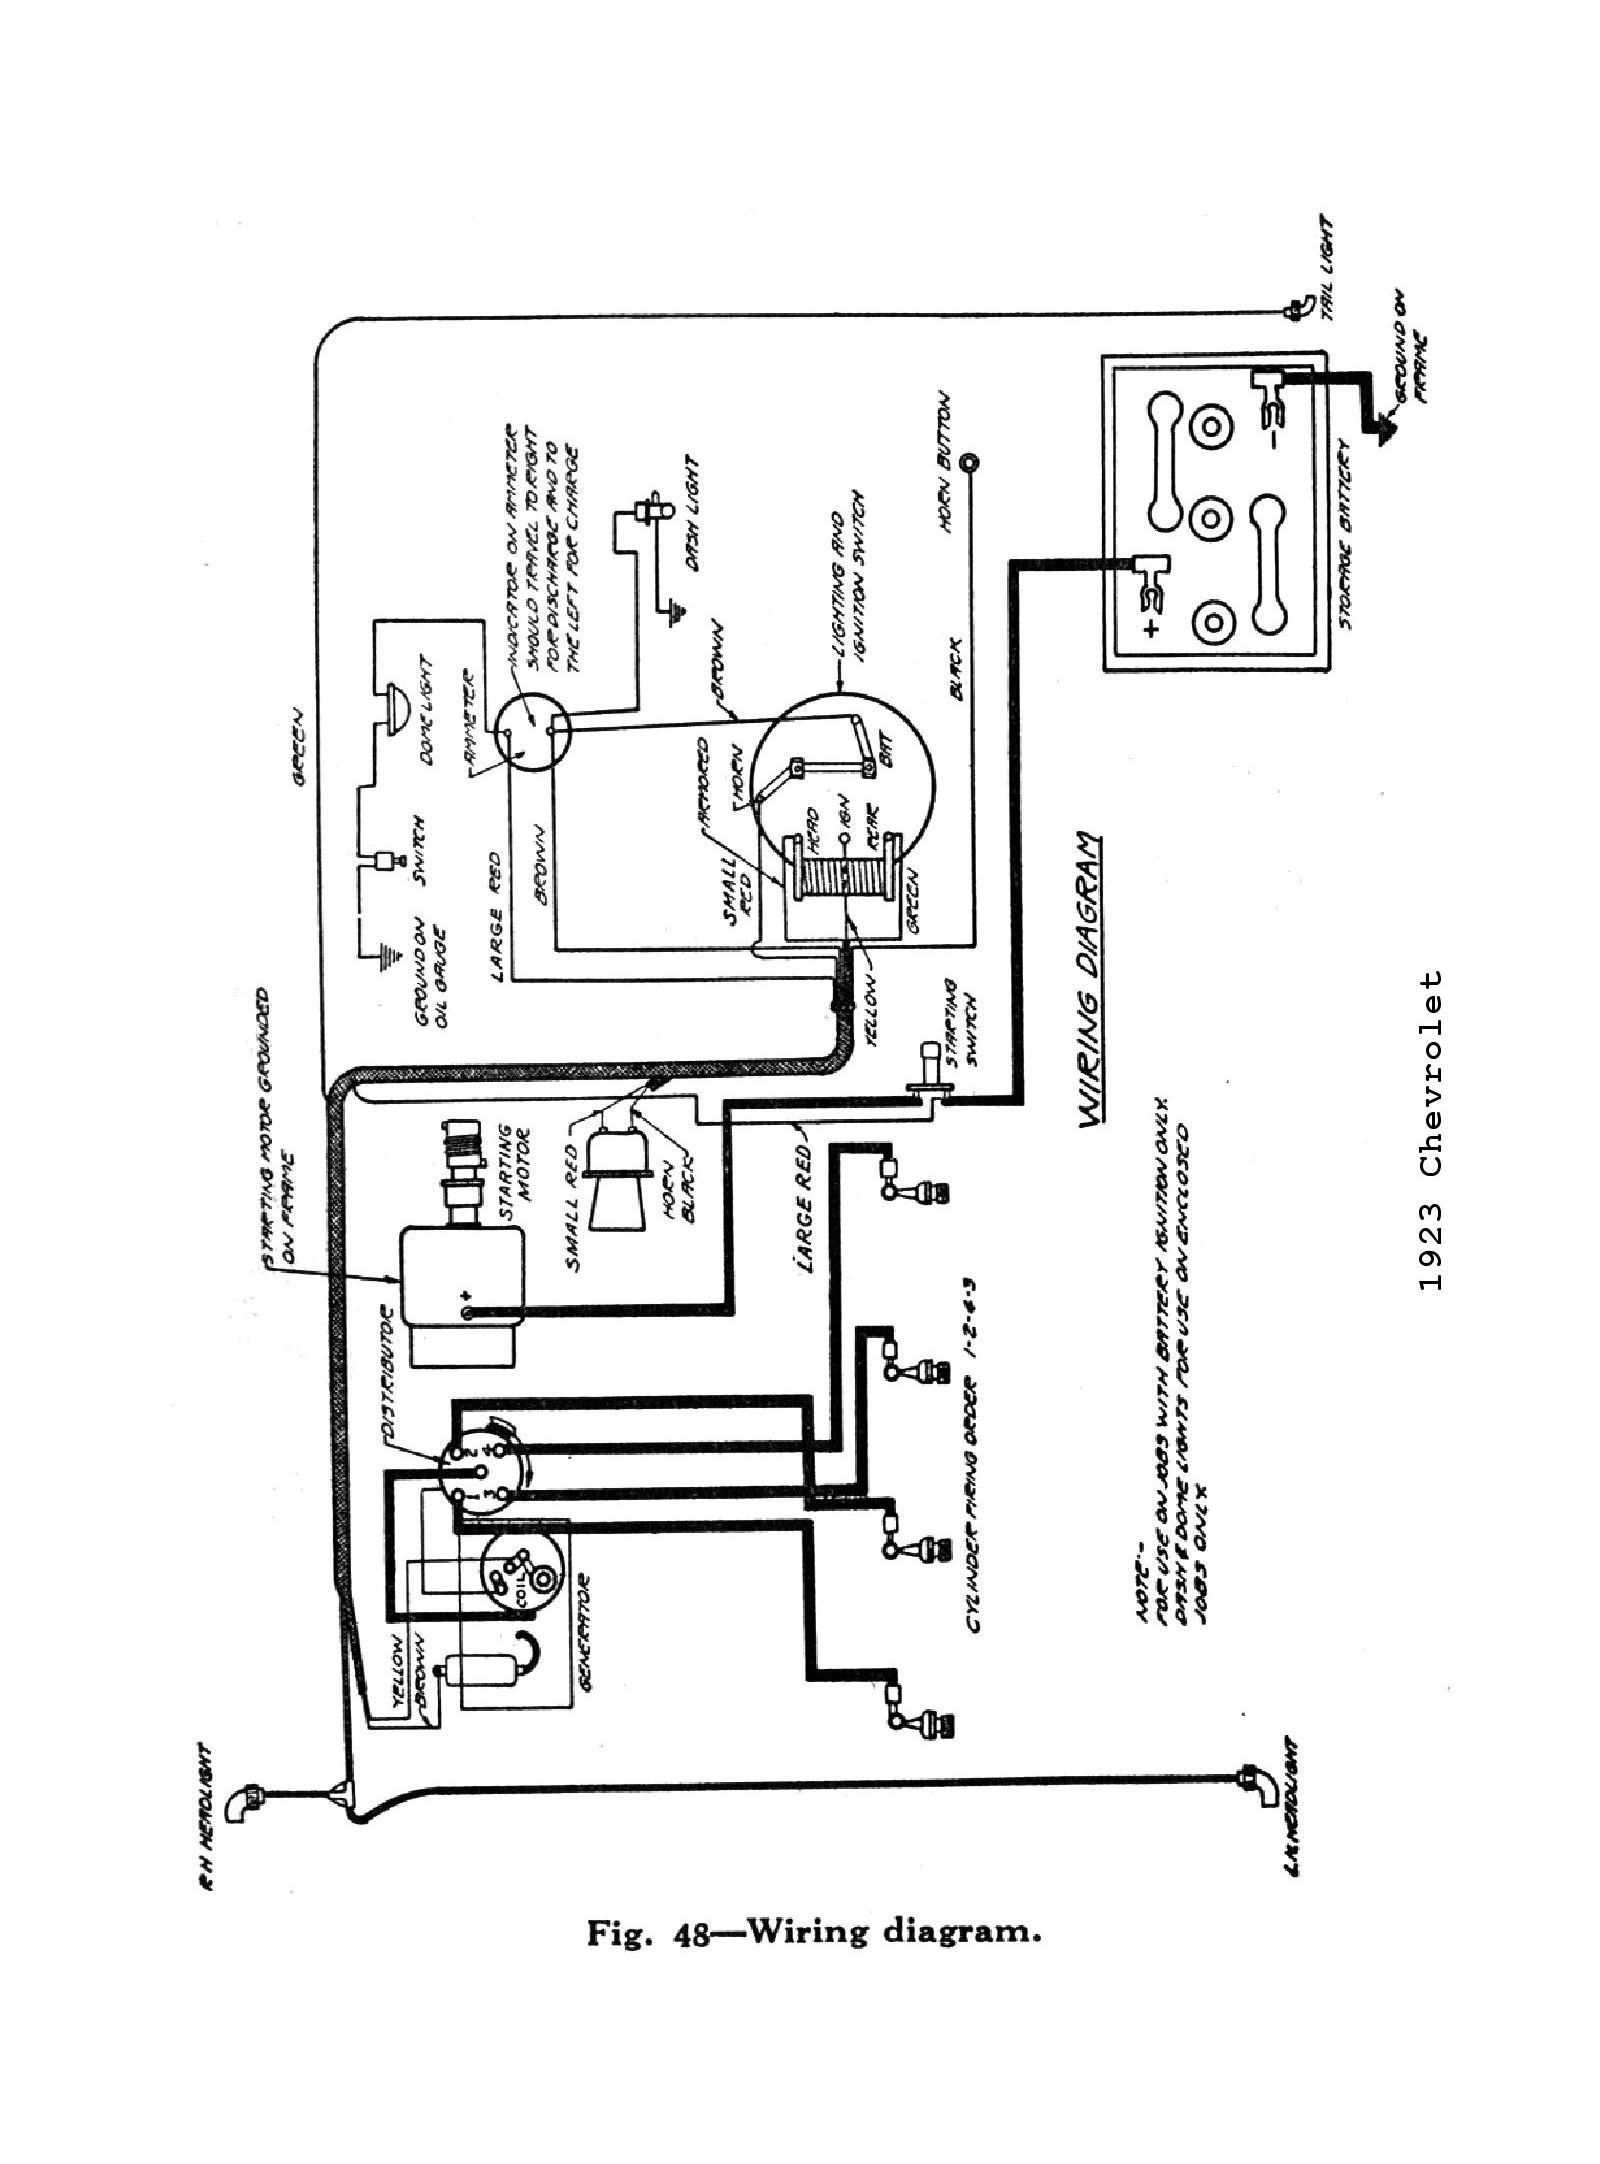 1966 Nova Turn Signal Wiring Diagram